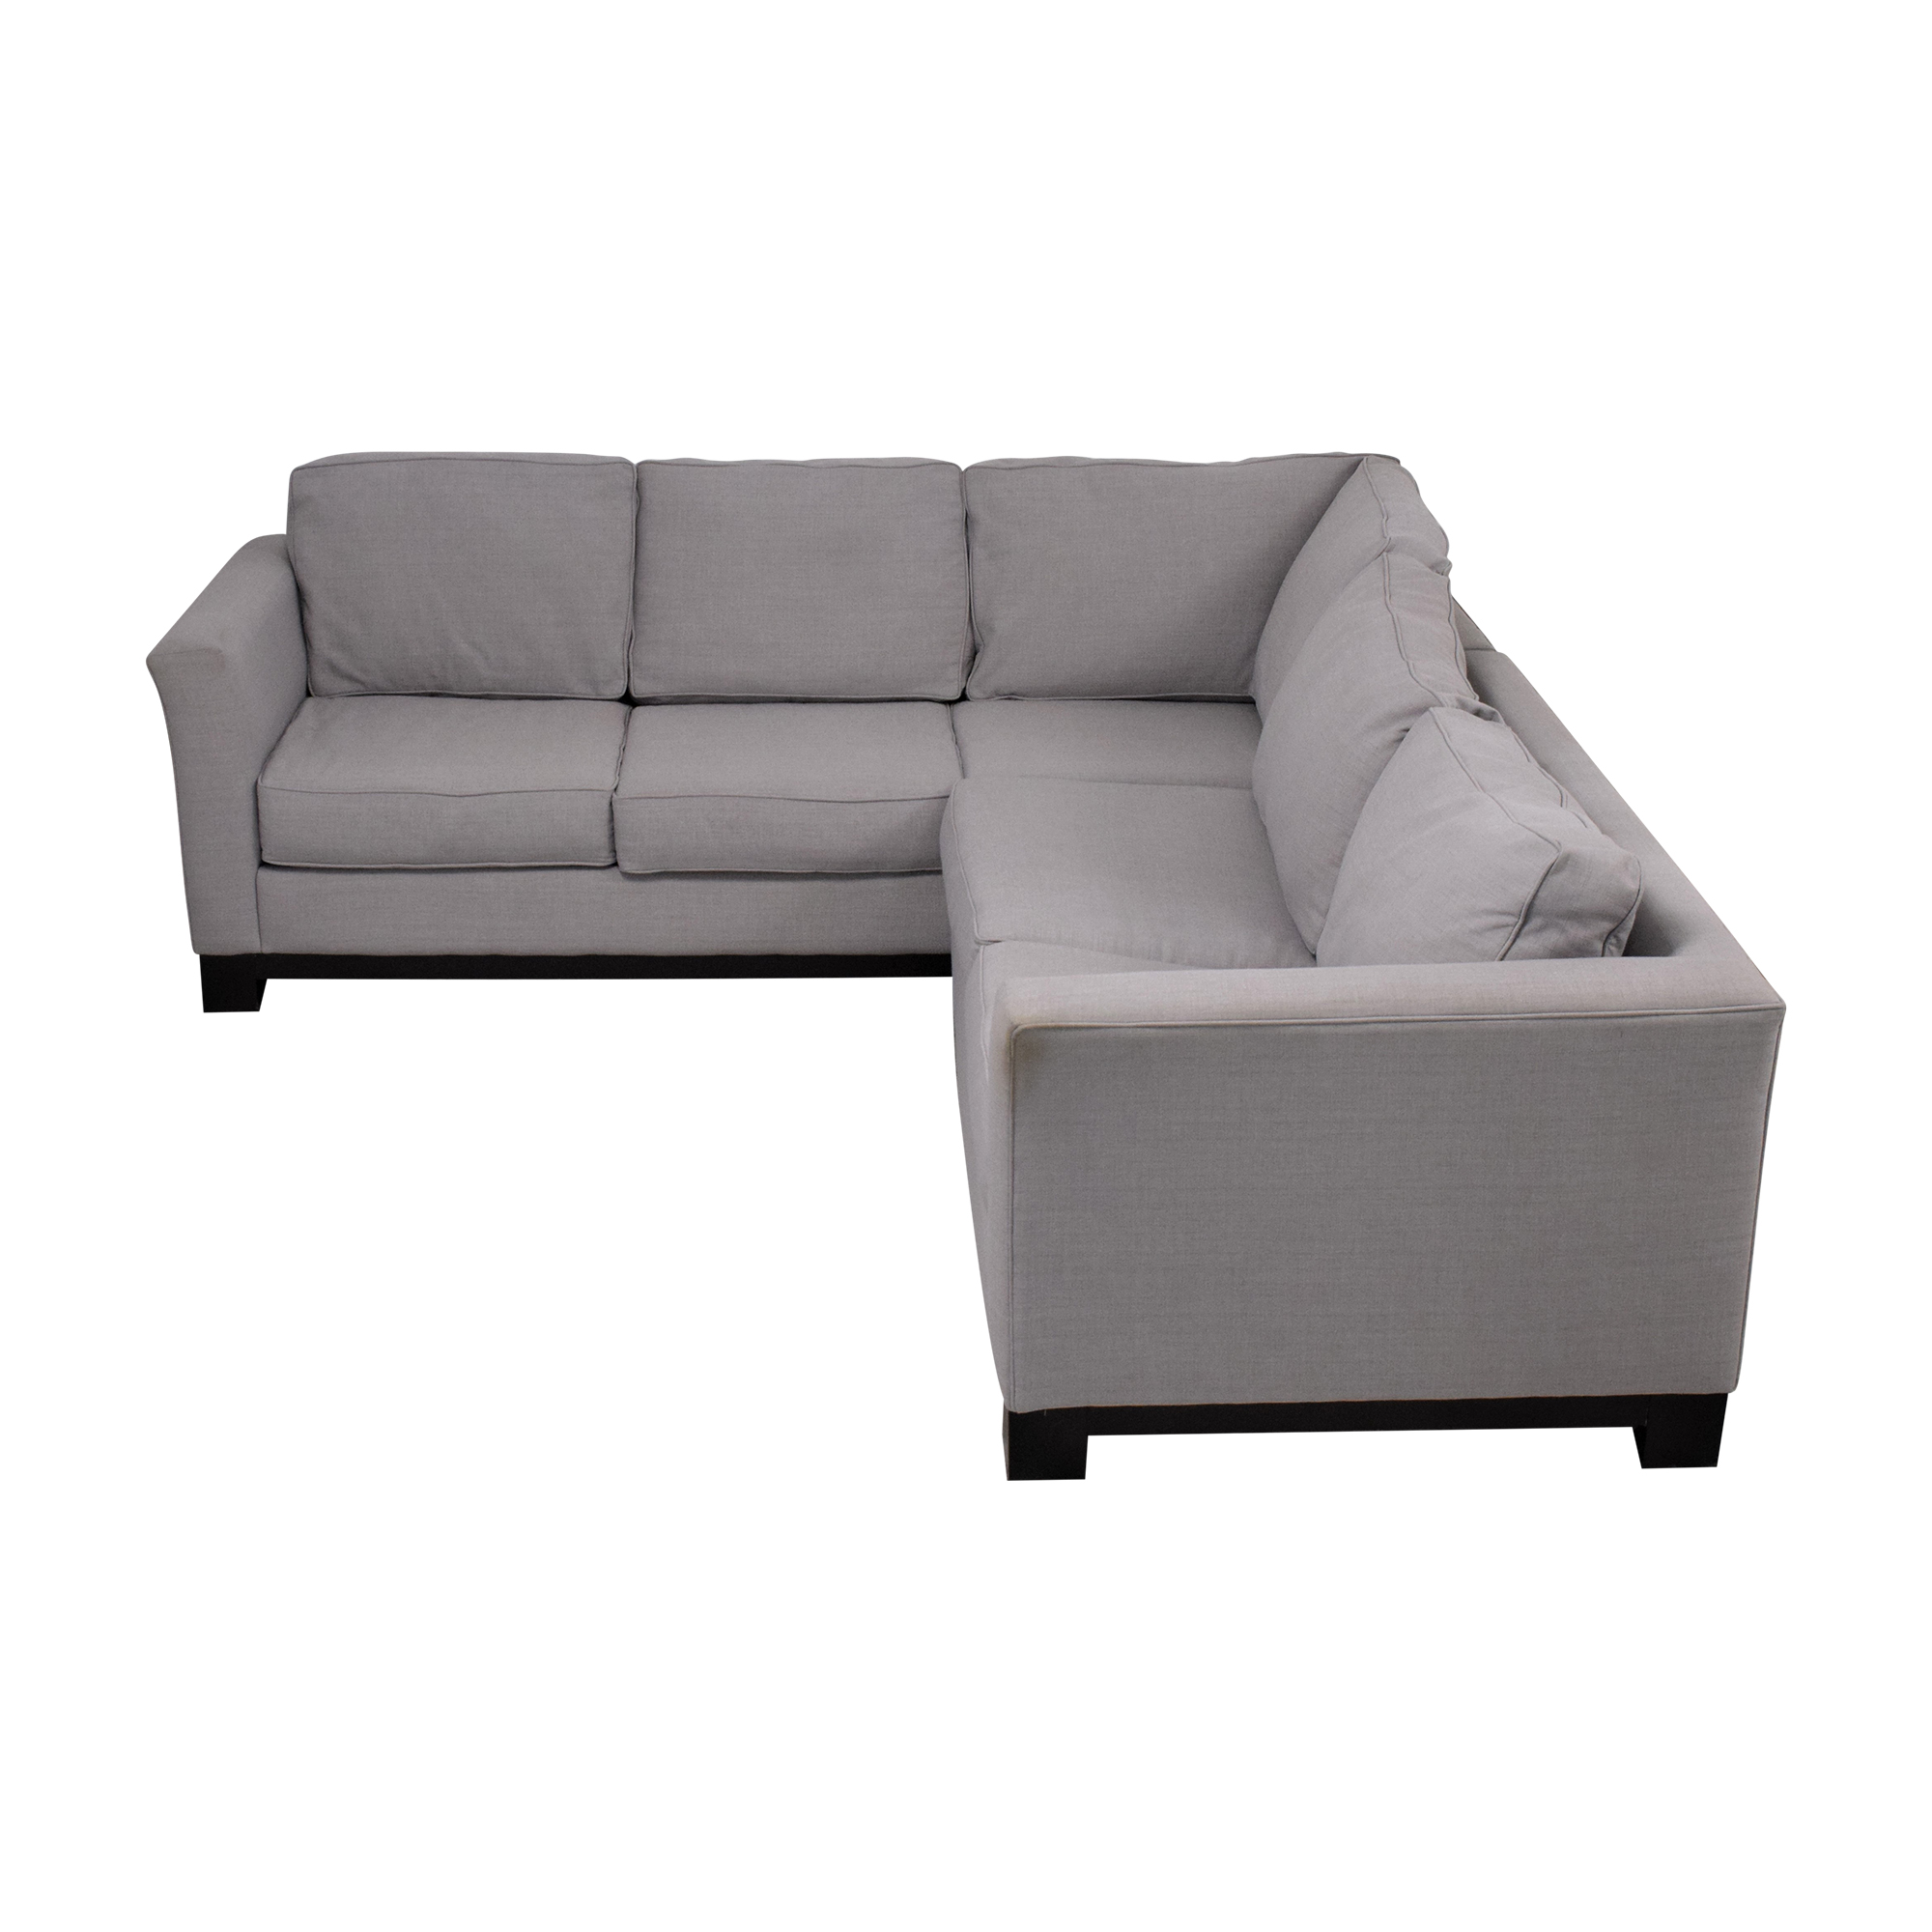 Macy's Elliot 2pc Sleeper Sofa Sectional Macy's